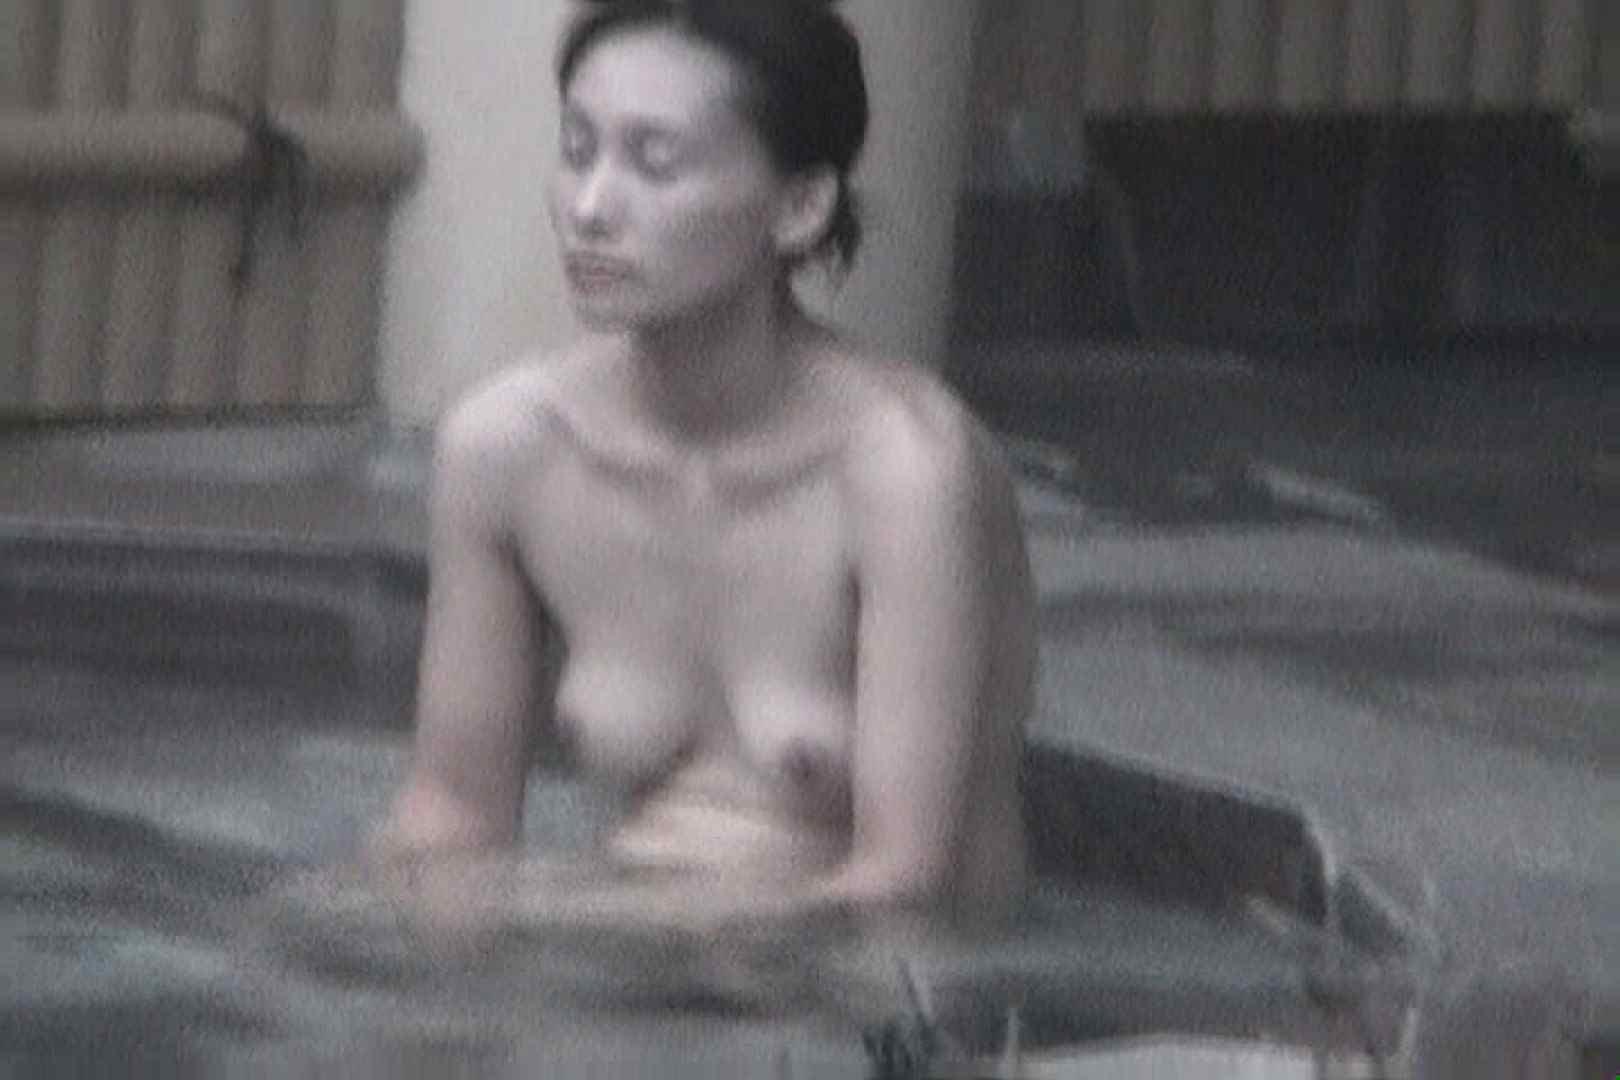 Aquaな露天風呂Vol.557 盗撮映像  23Pix 6